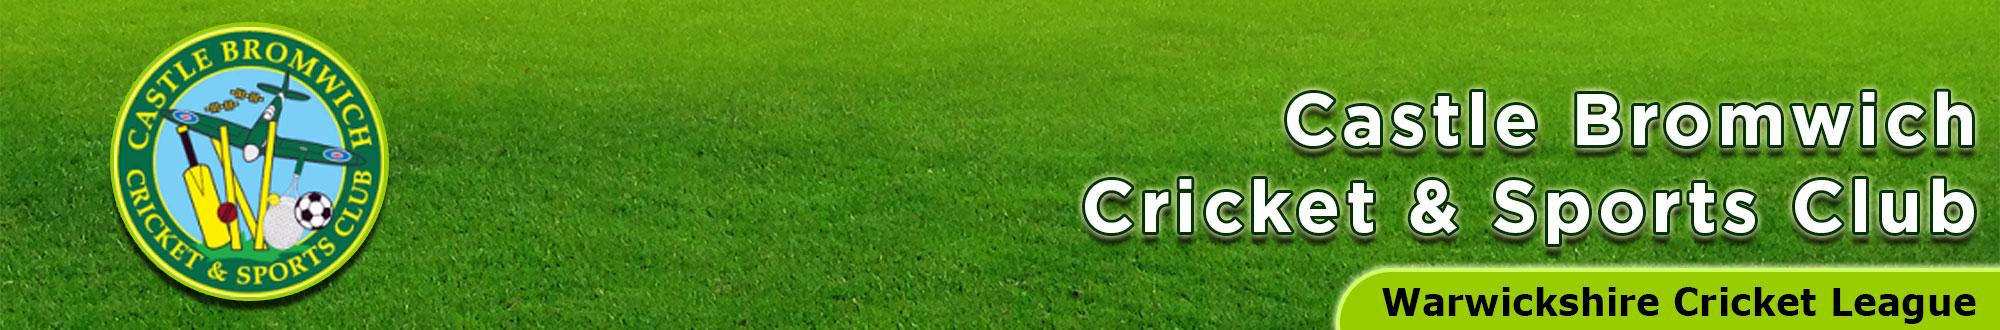 Castle Bromwich Cricket Club ~ Warwickshire Cricket League